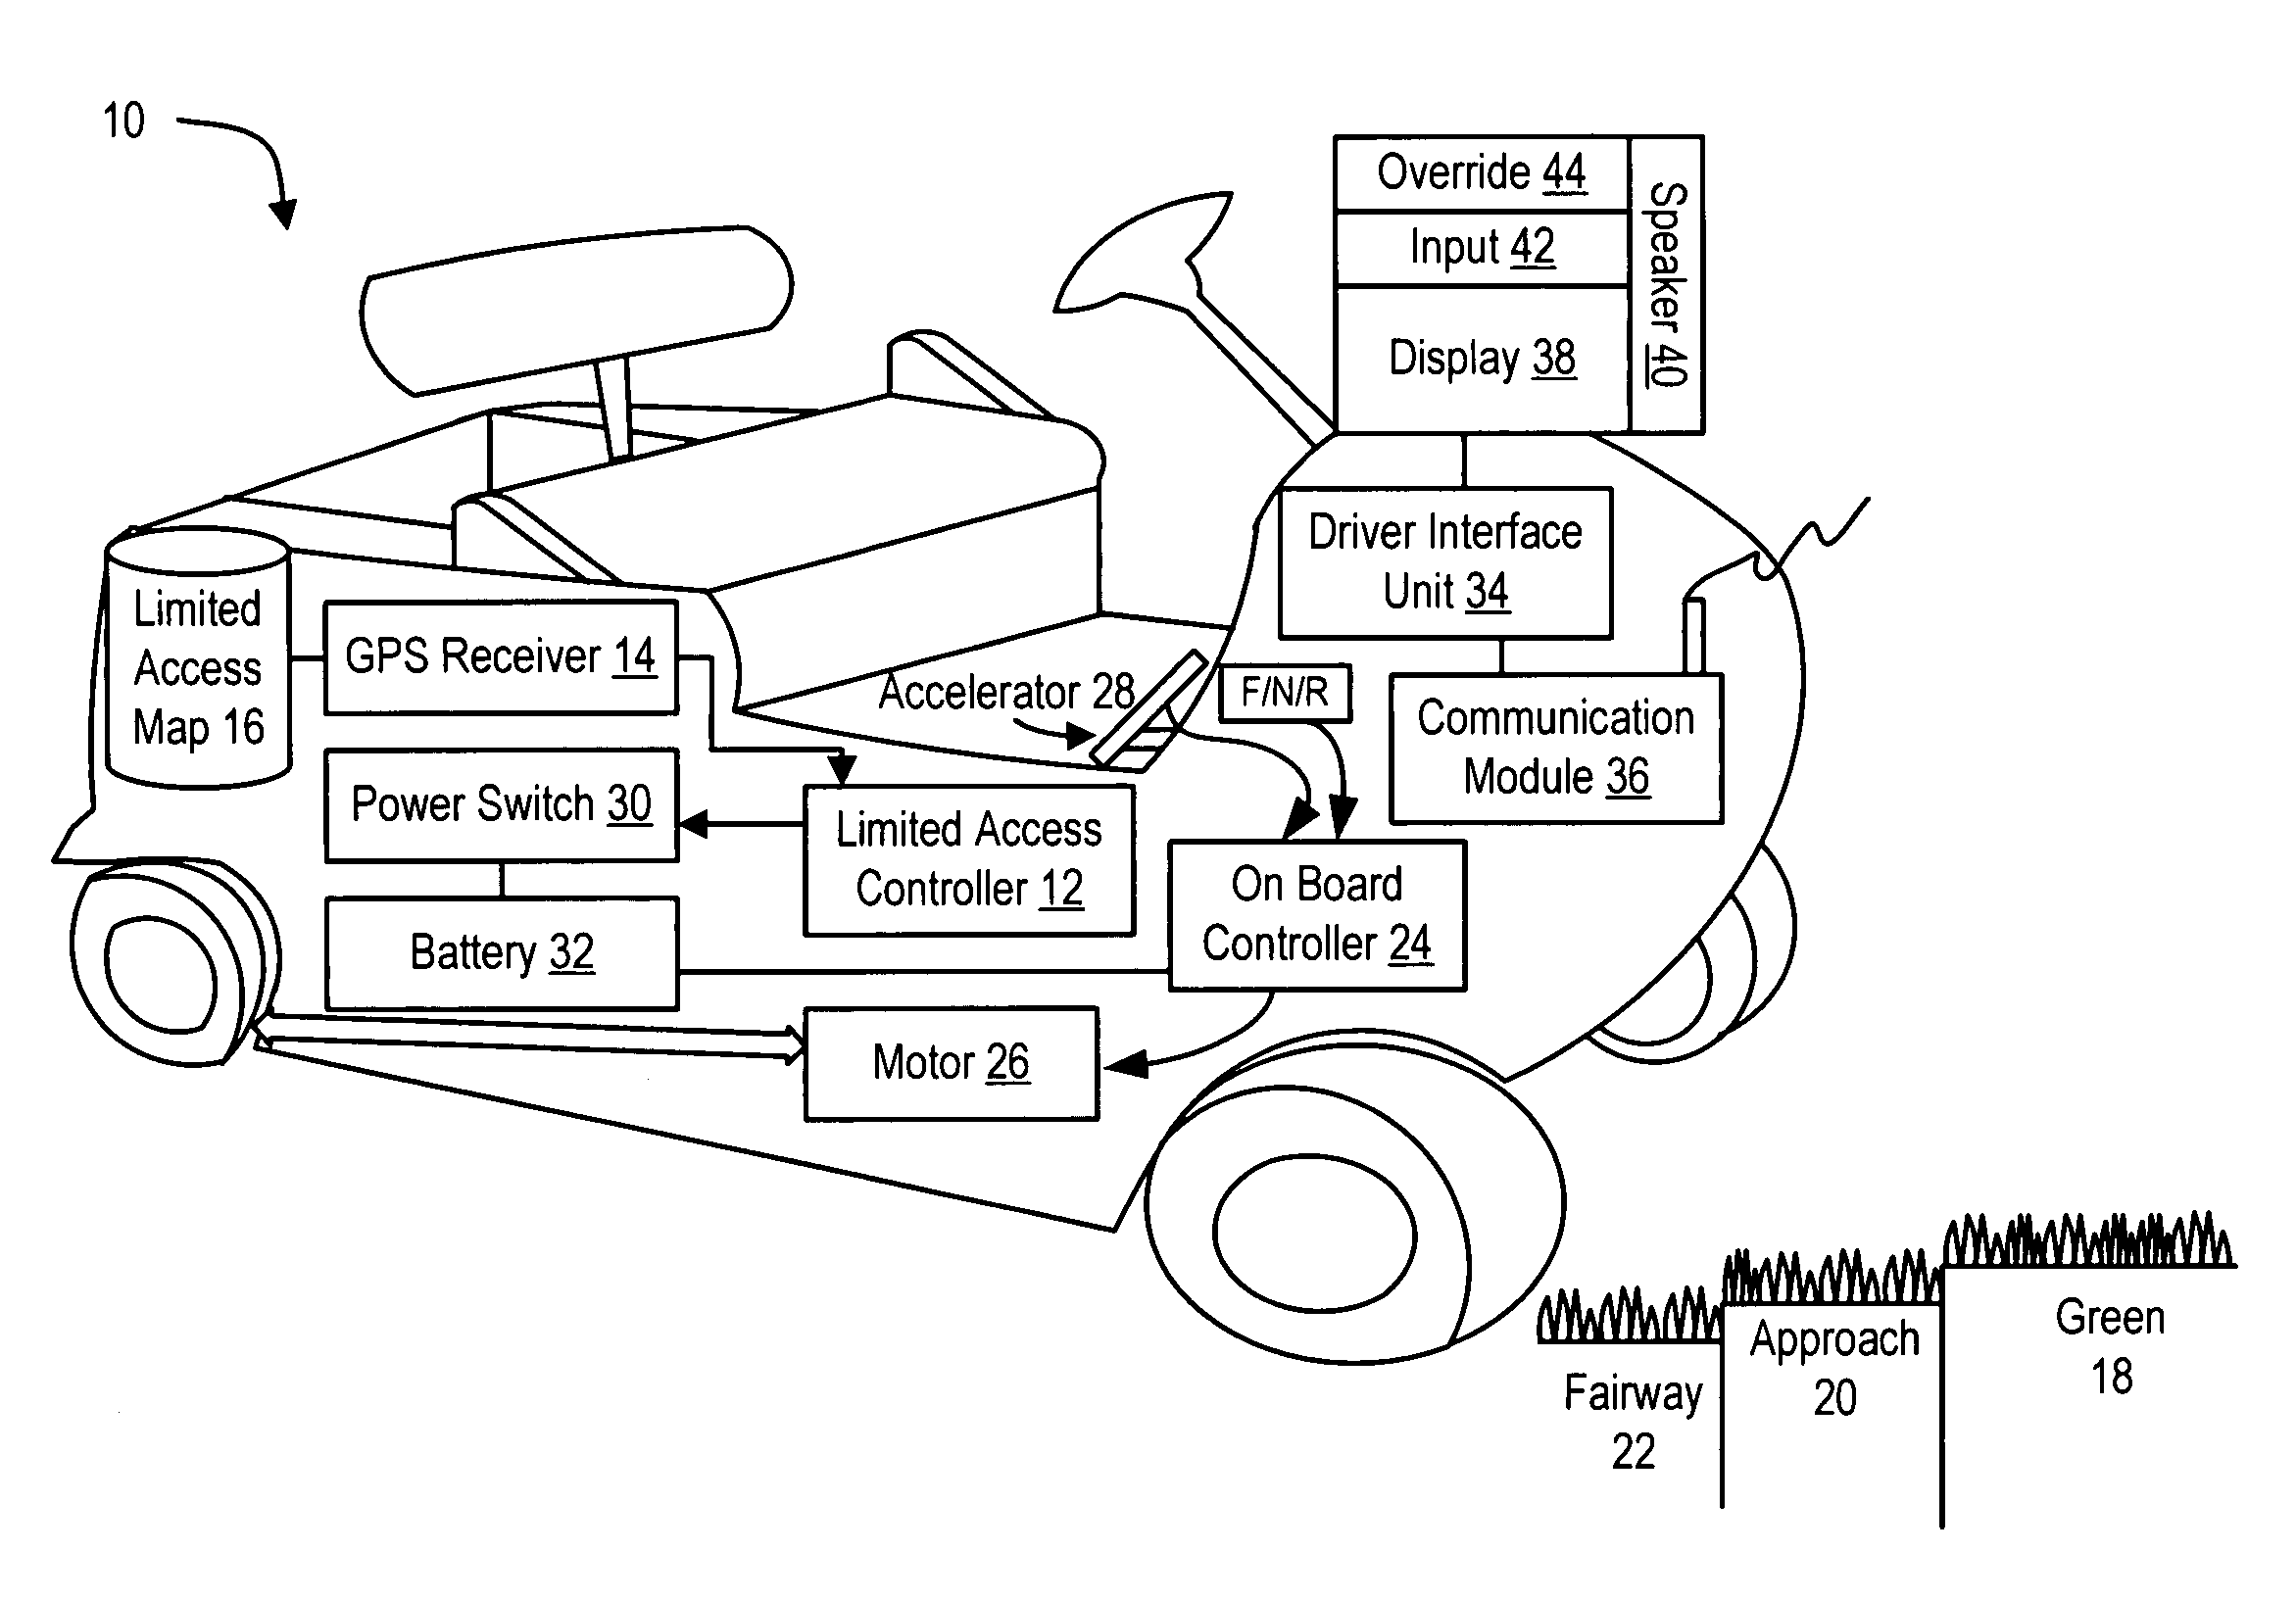 battery wiring diagram for ezgo golf cart wiring diagram Textron Golf Cart Wiring Diagram 1989 ez go textron golf cart wiring diagram textron golf cart wiring diagram